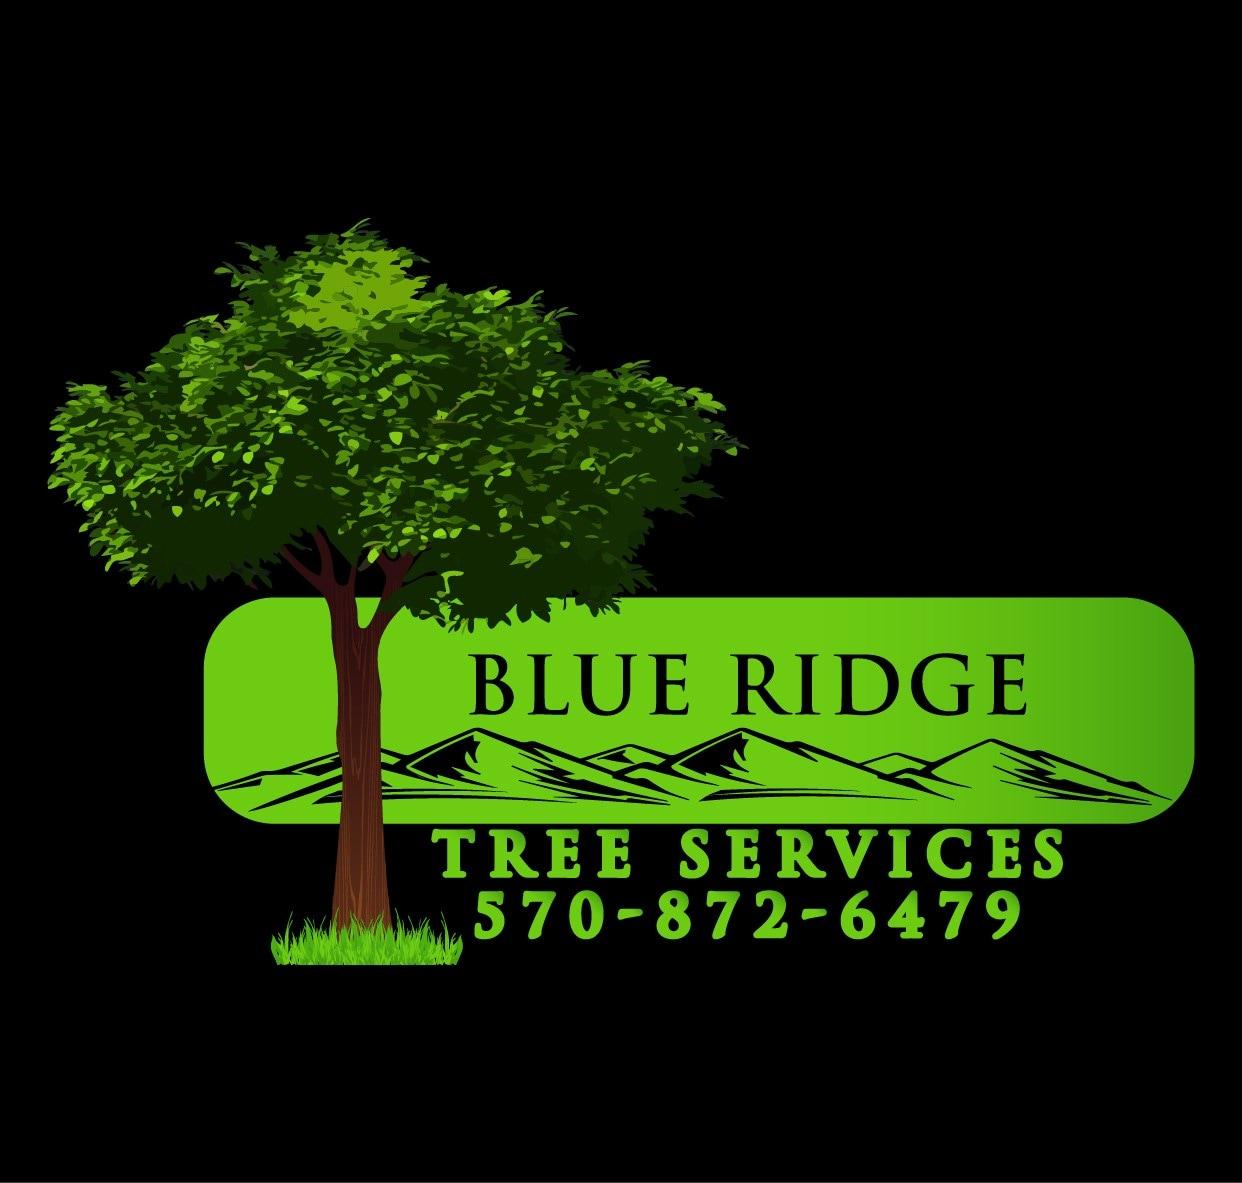 Blue Ridge Tree Services